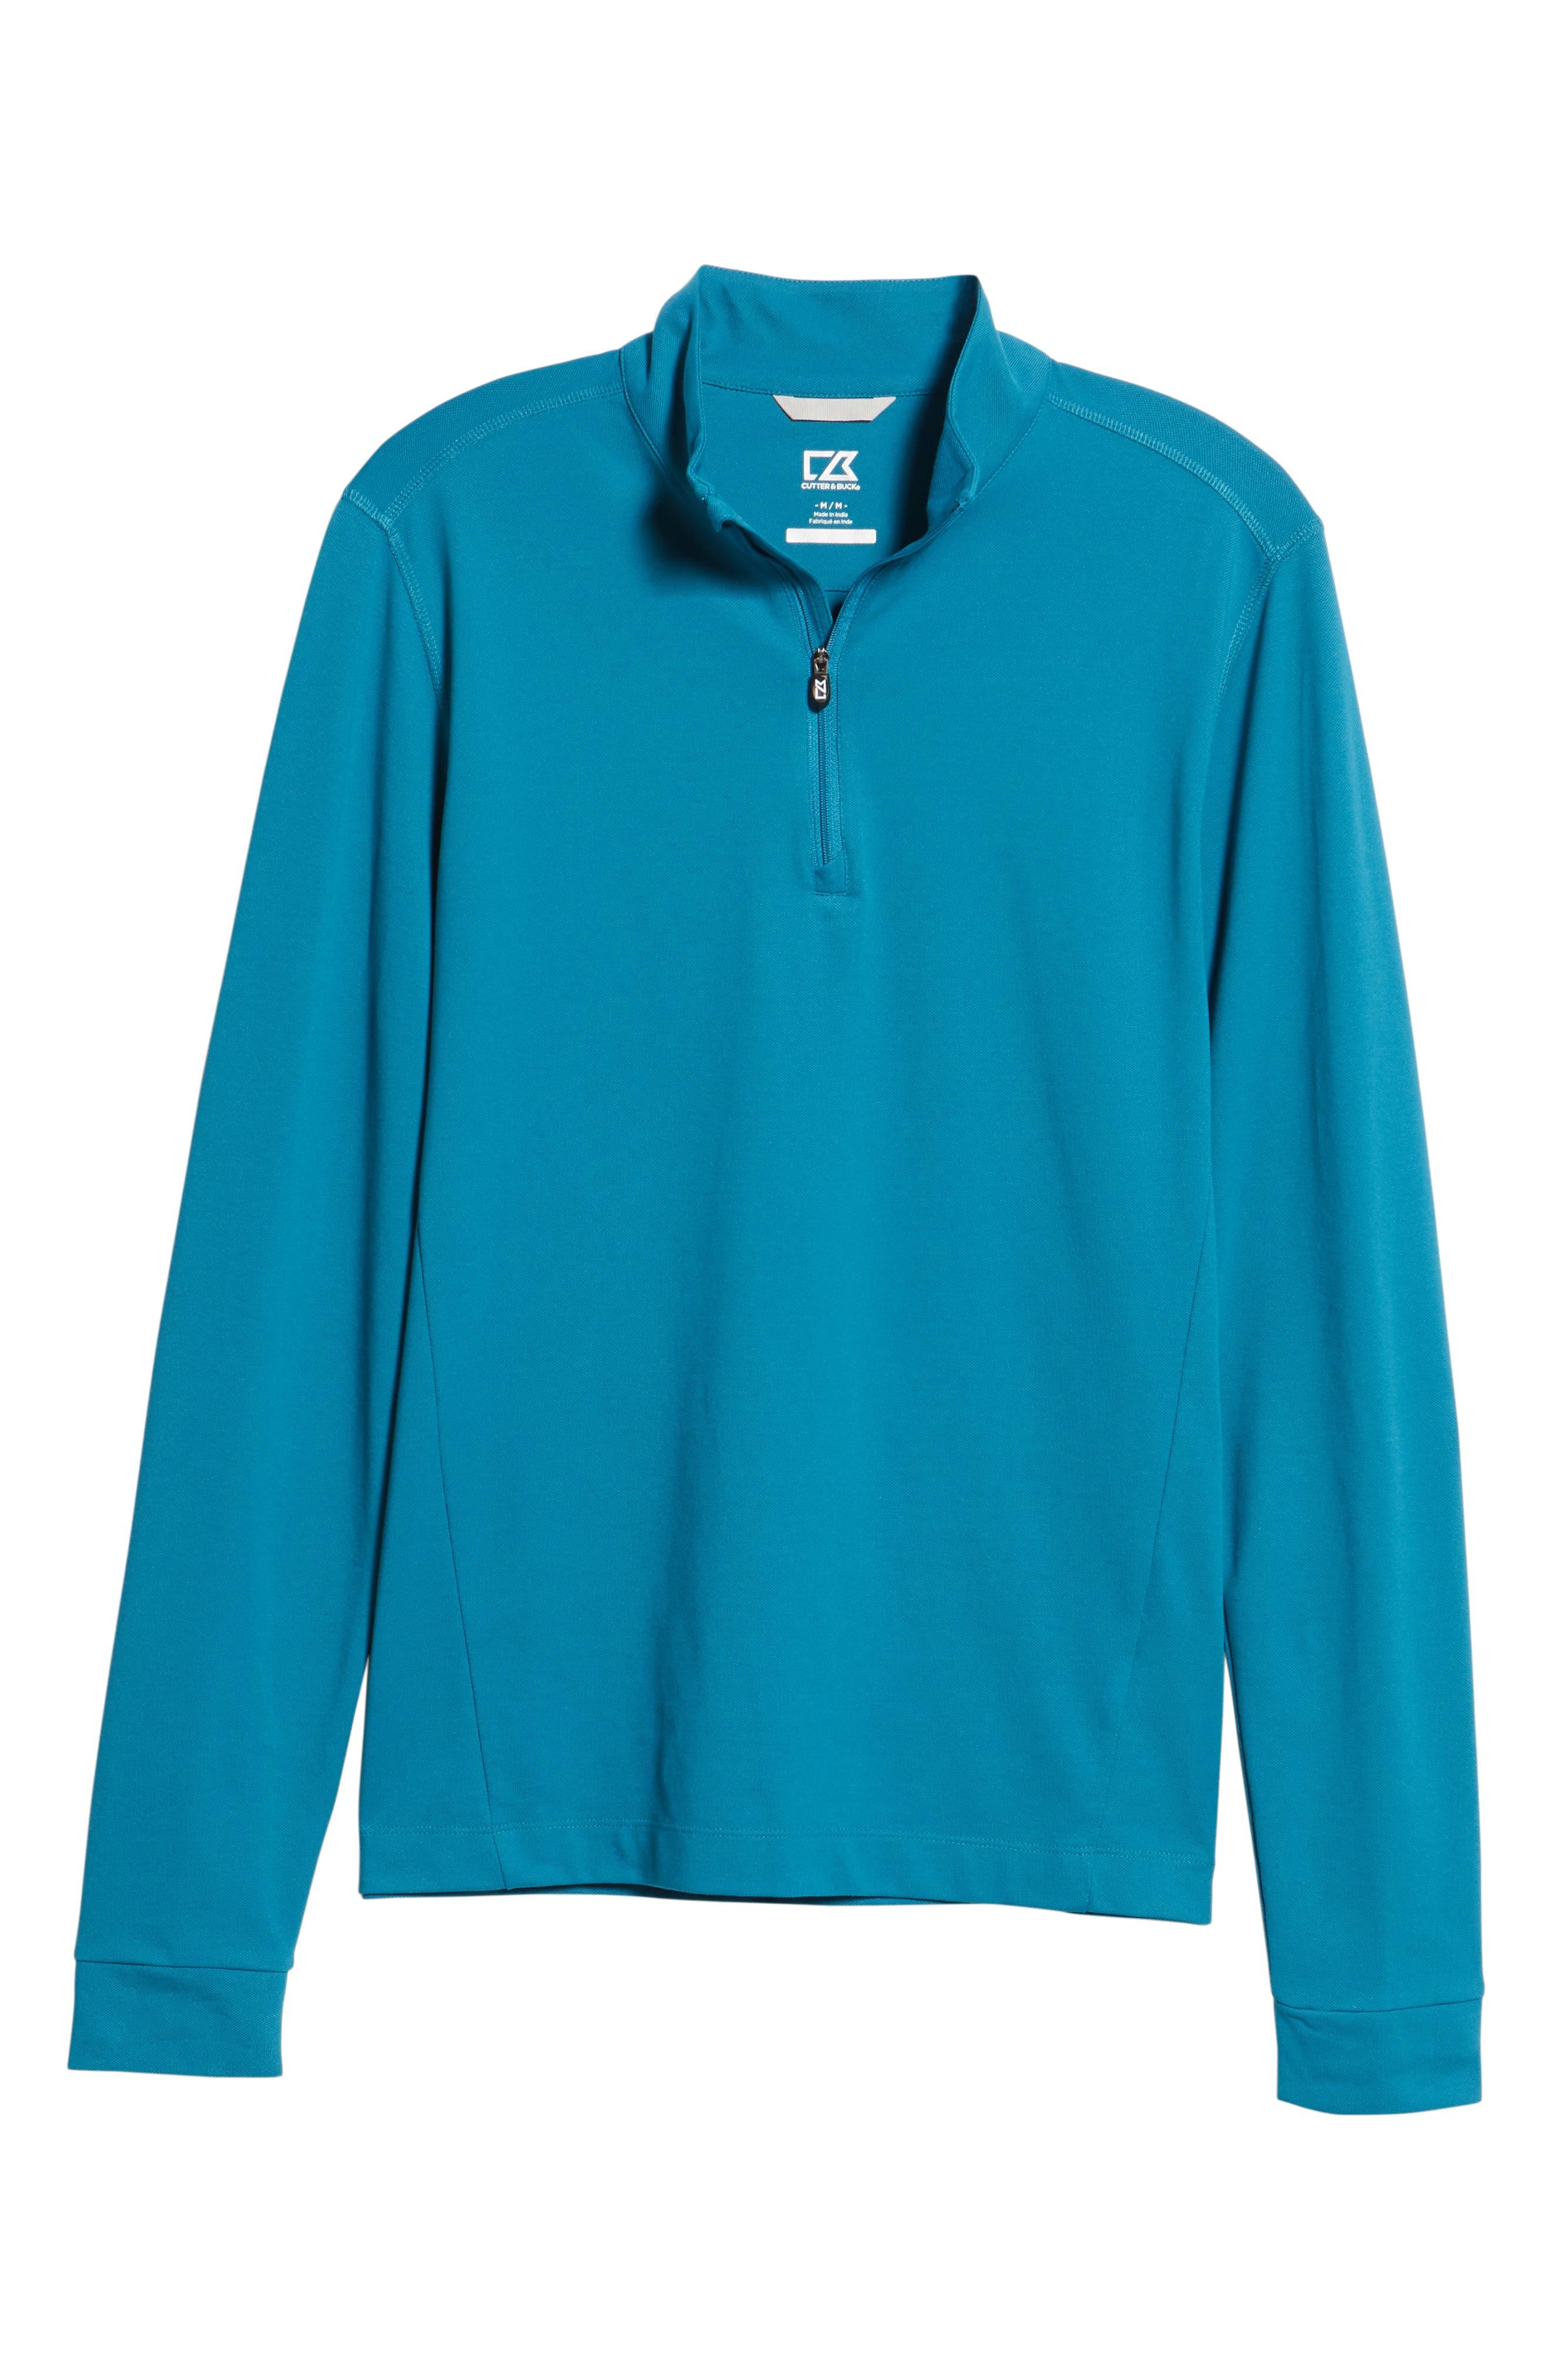 CUTTER & BUCK, Advantage Regular Fit DryTec Mock Neck Pullover, Alternate thumbnail 6, color, TEAL BLUE